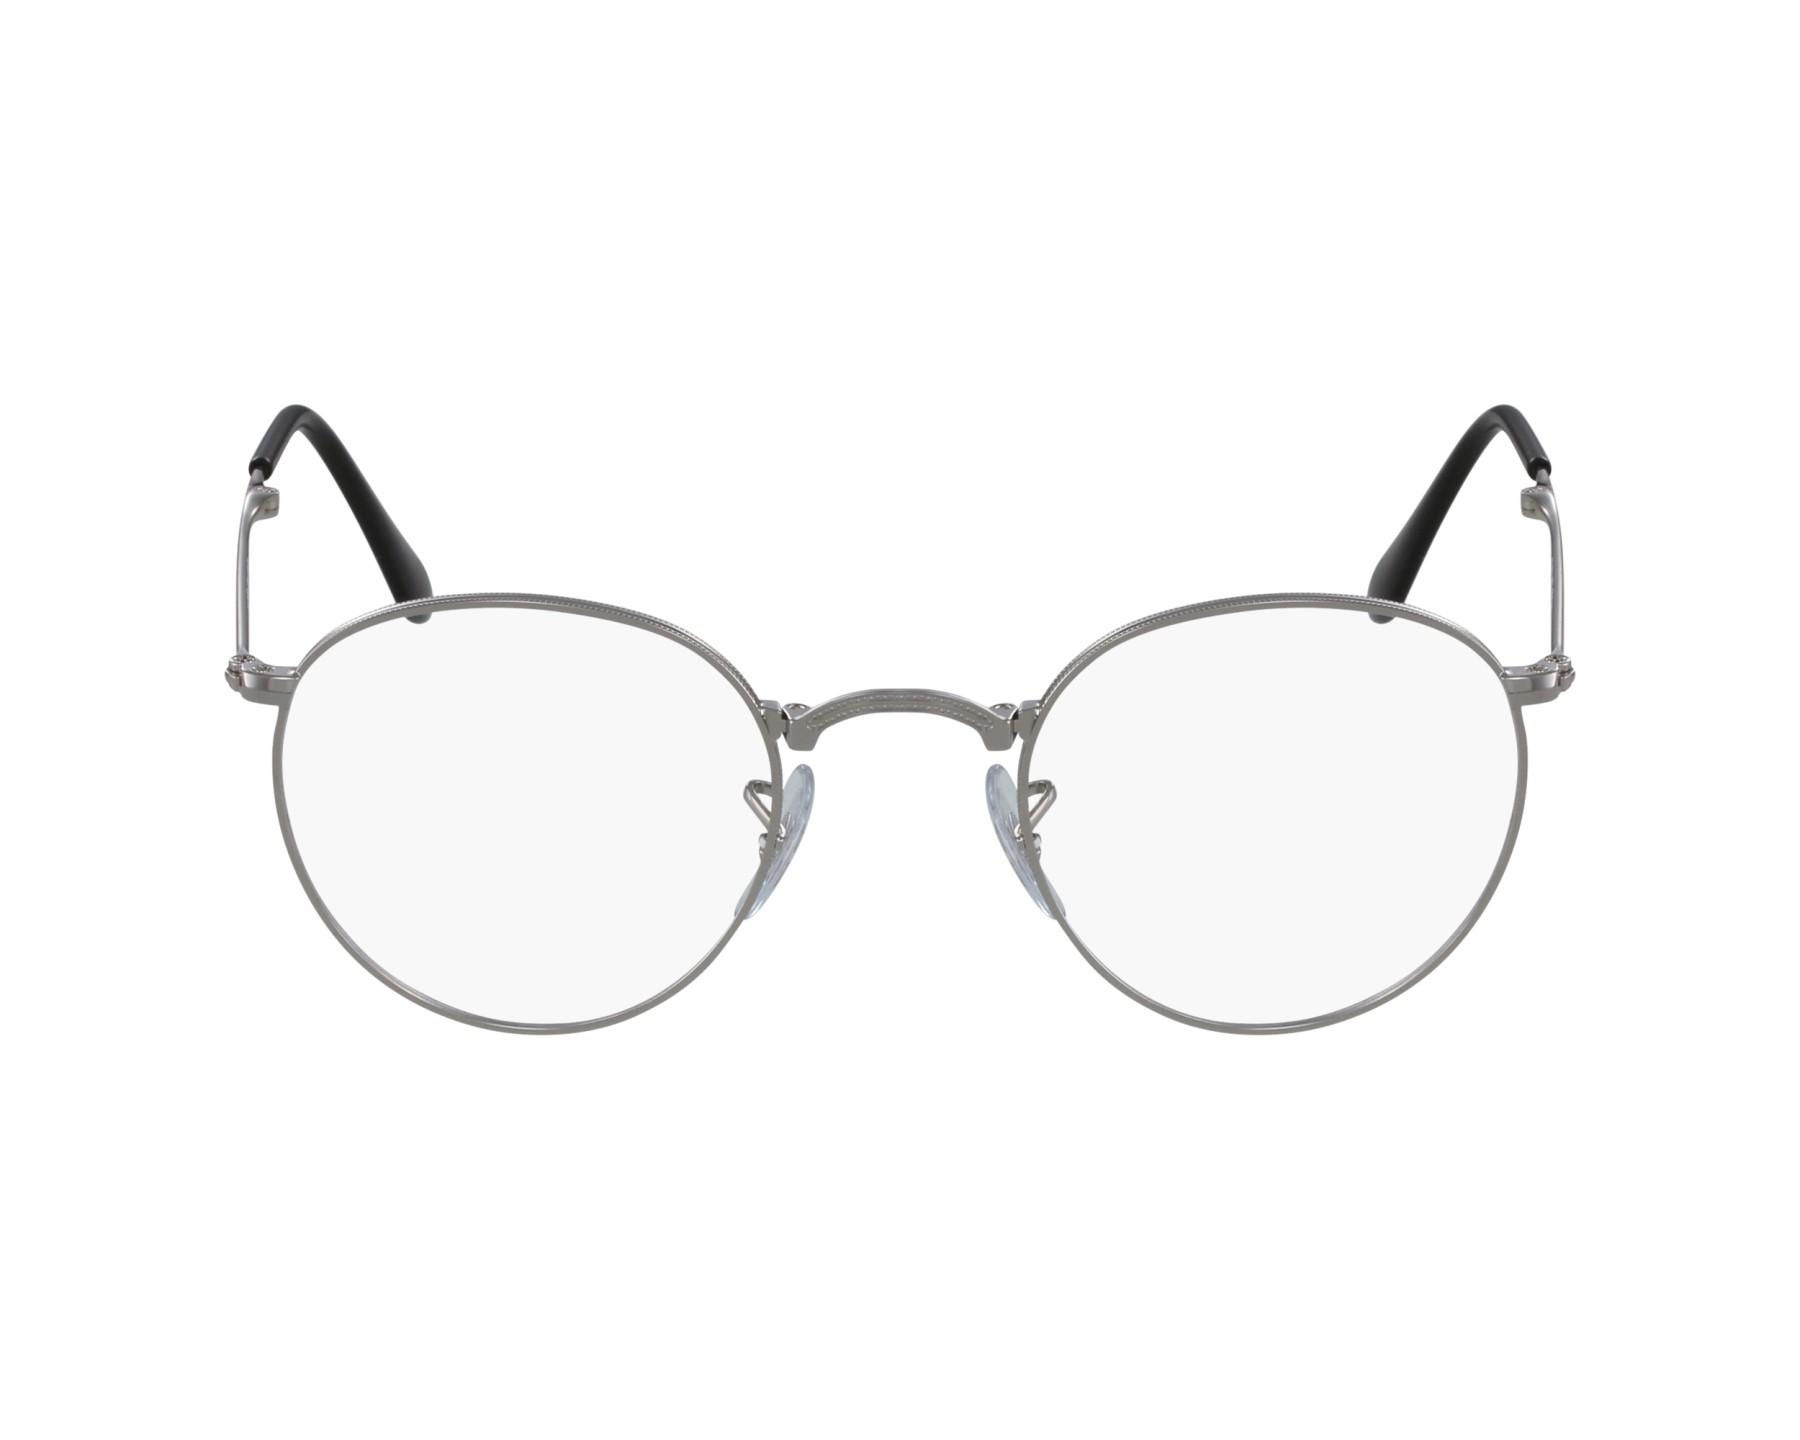 fa89b3a779a eyeglasses Ray-Ban RX-3532 2501 47-20 Silver profile view